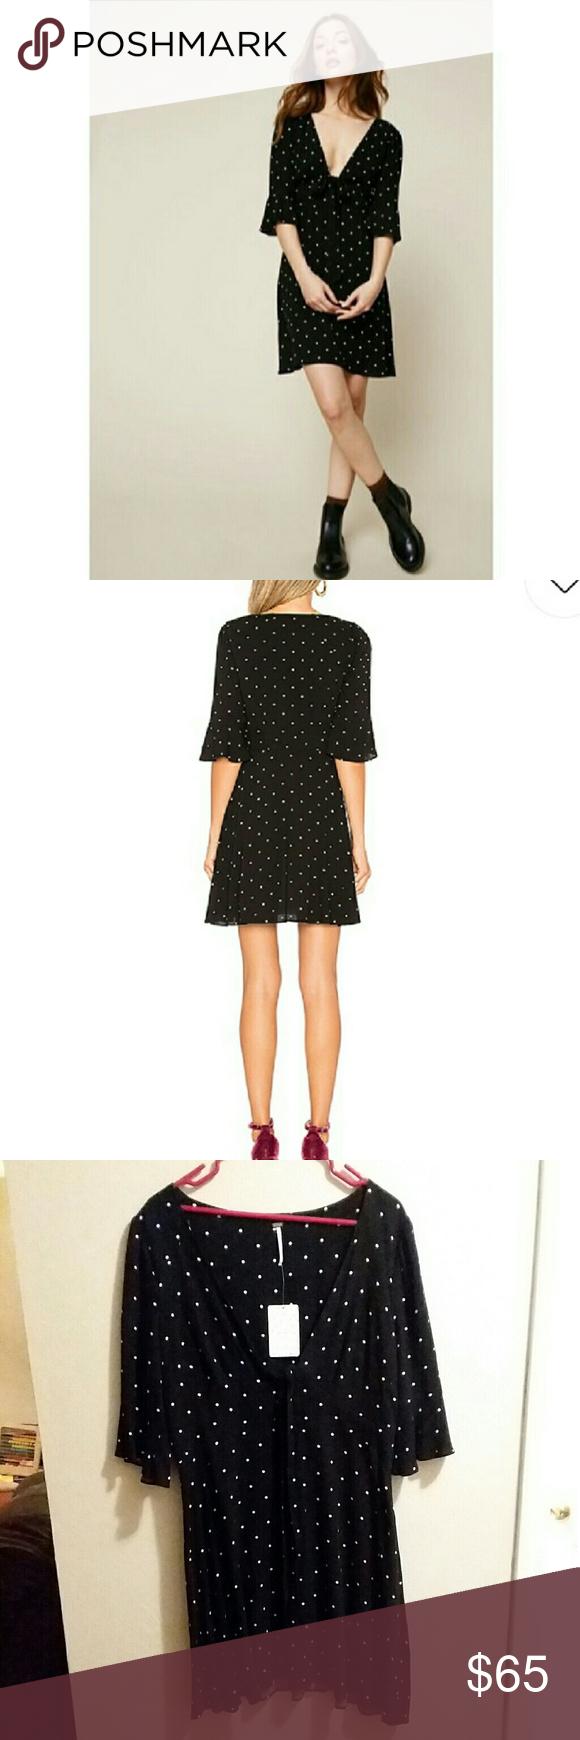 c077d29b2536e Free People NWT Black with White Polka Dot Dress NWT Free People black mini  dress with